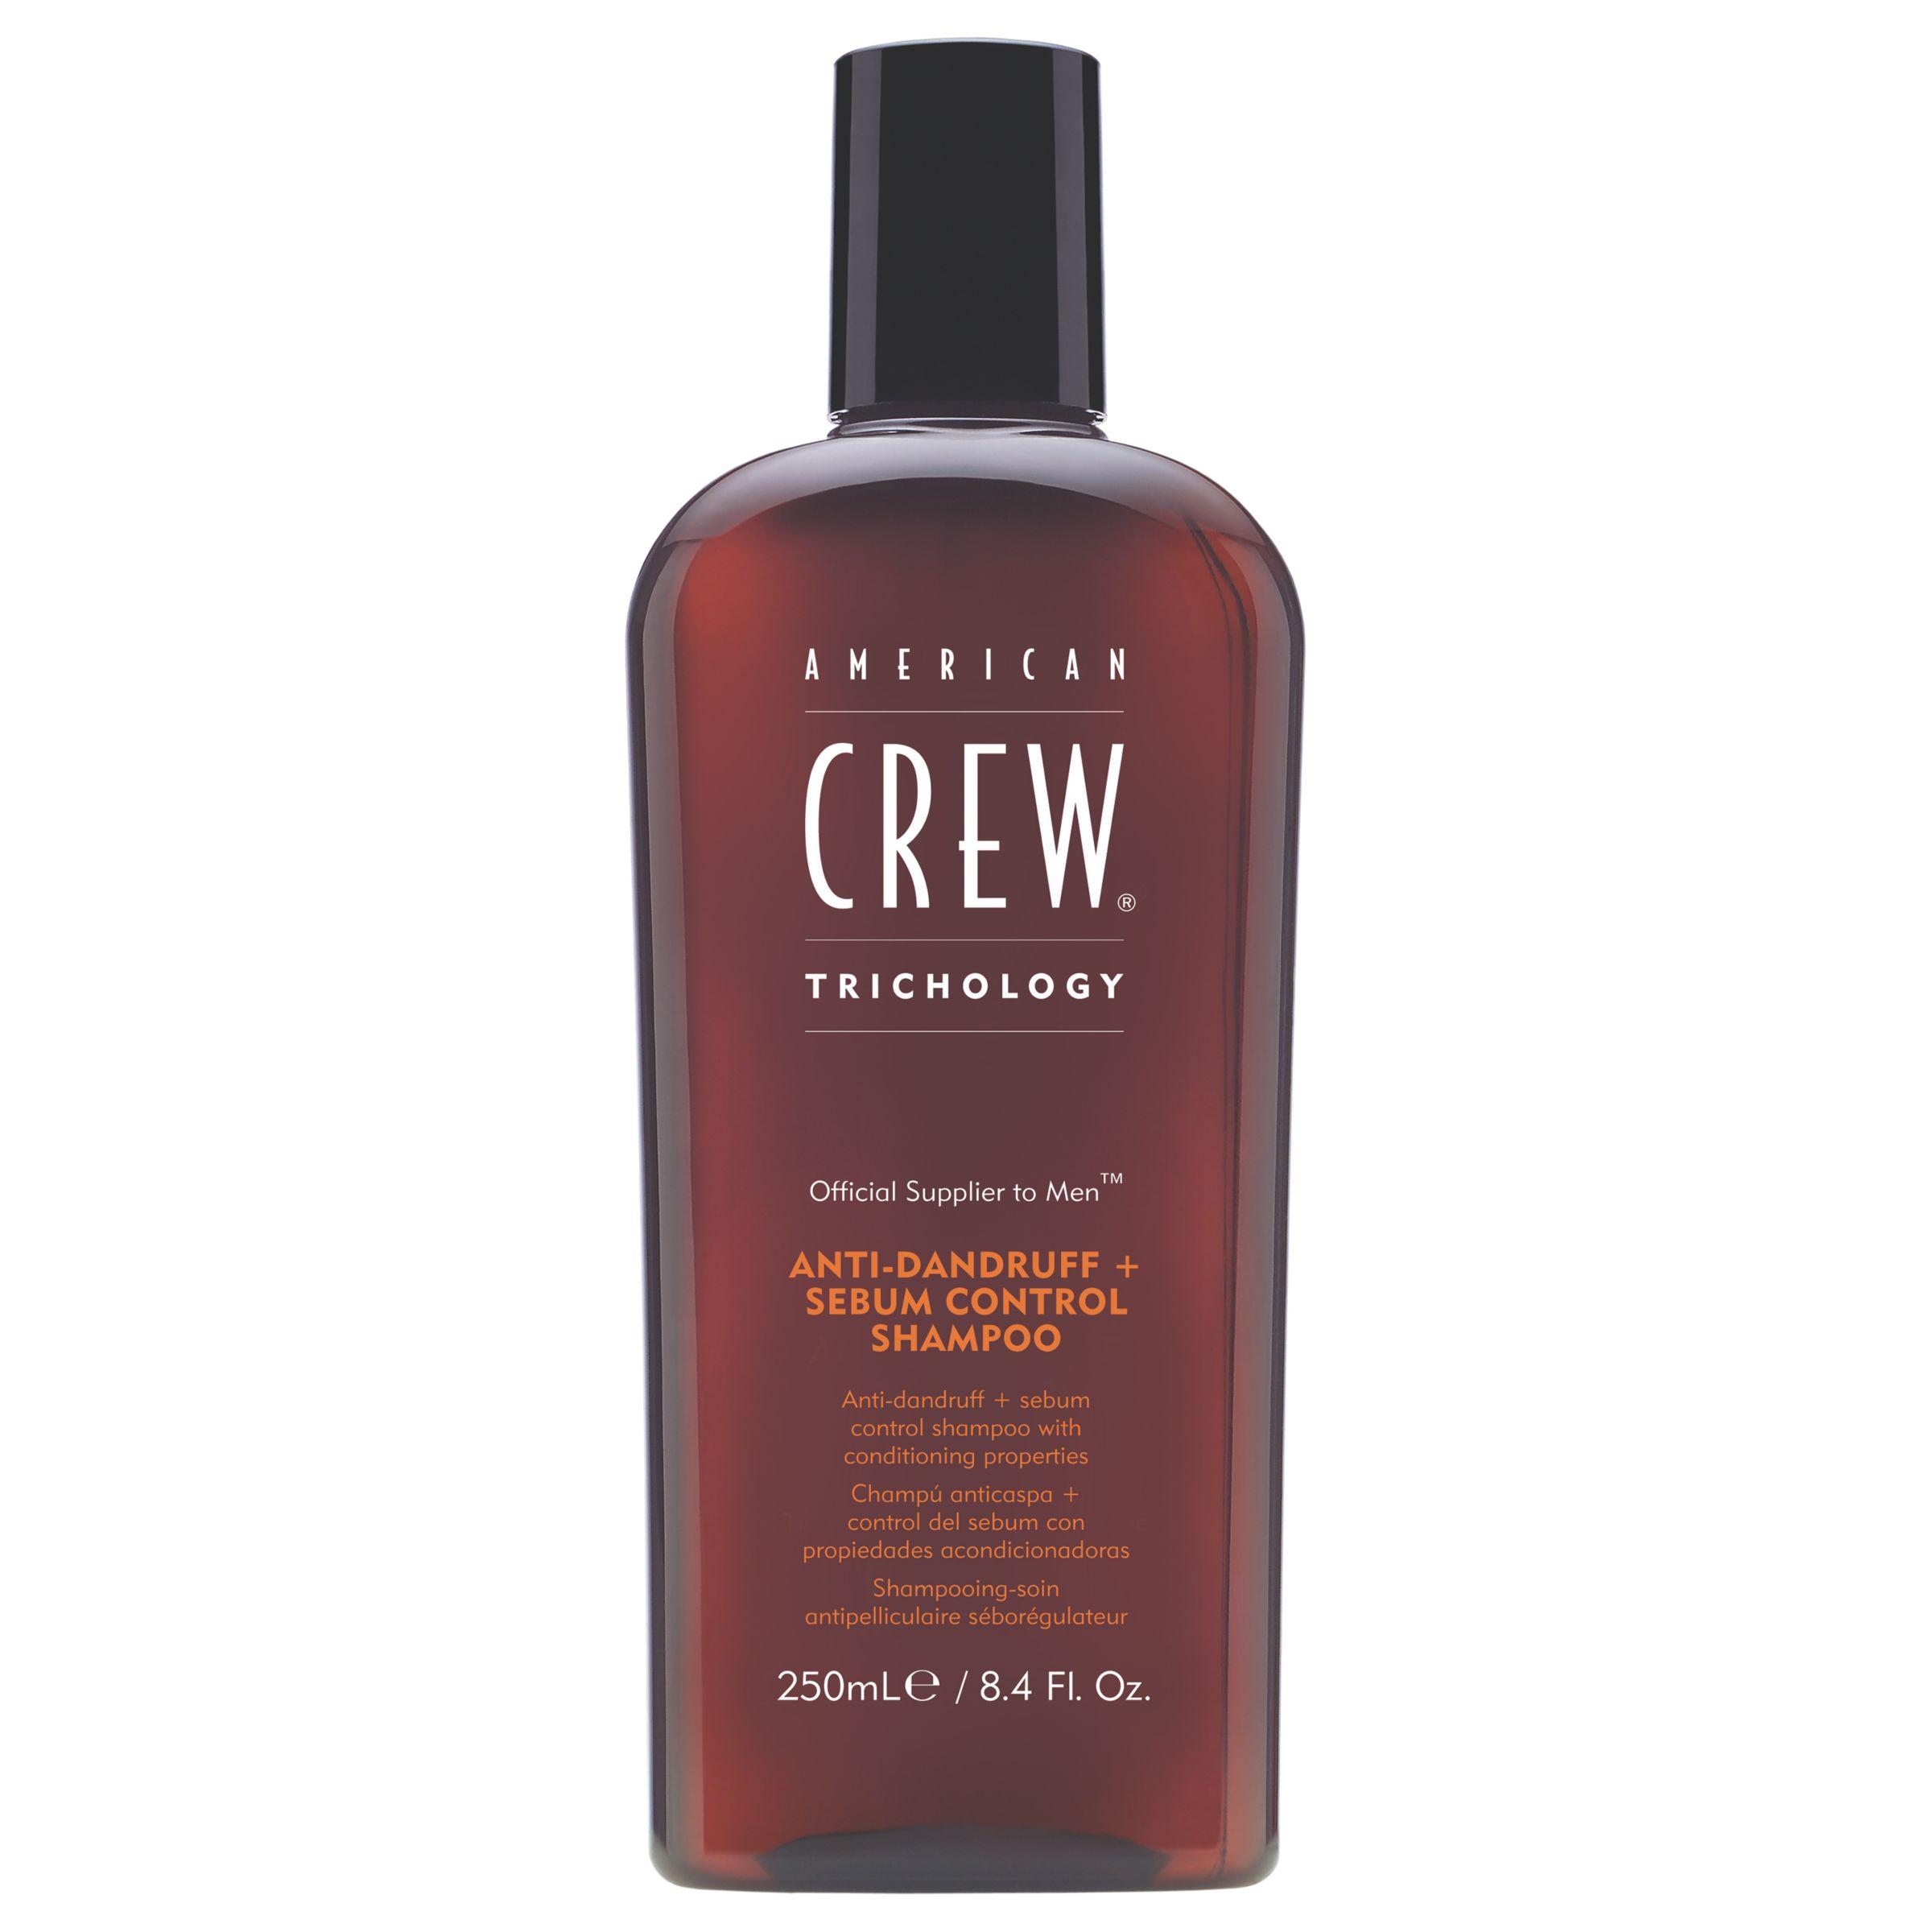 American Crew American Crew Anti-Dandruff + Sebum Control Shampoo, 250ml